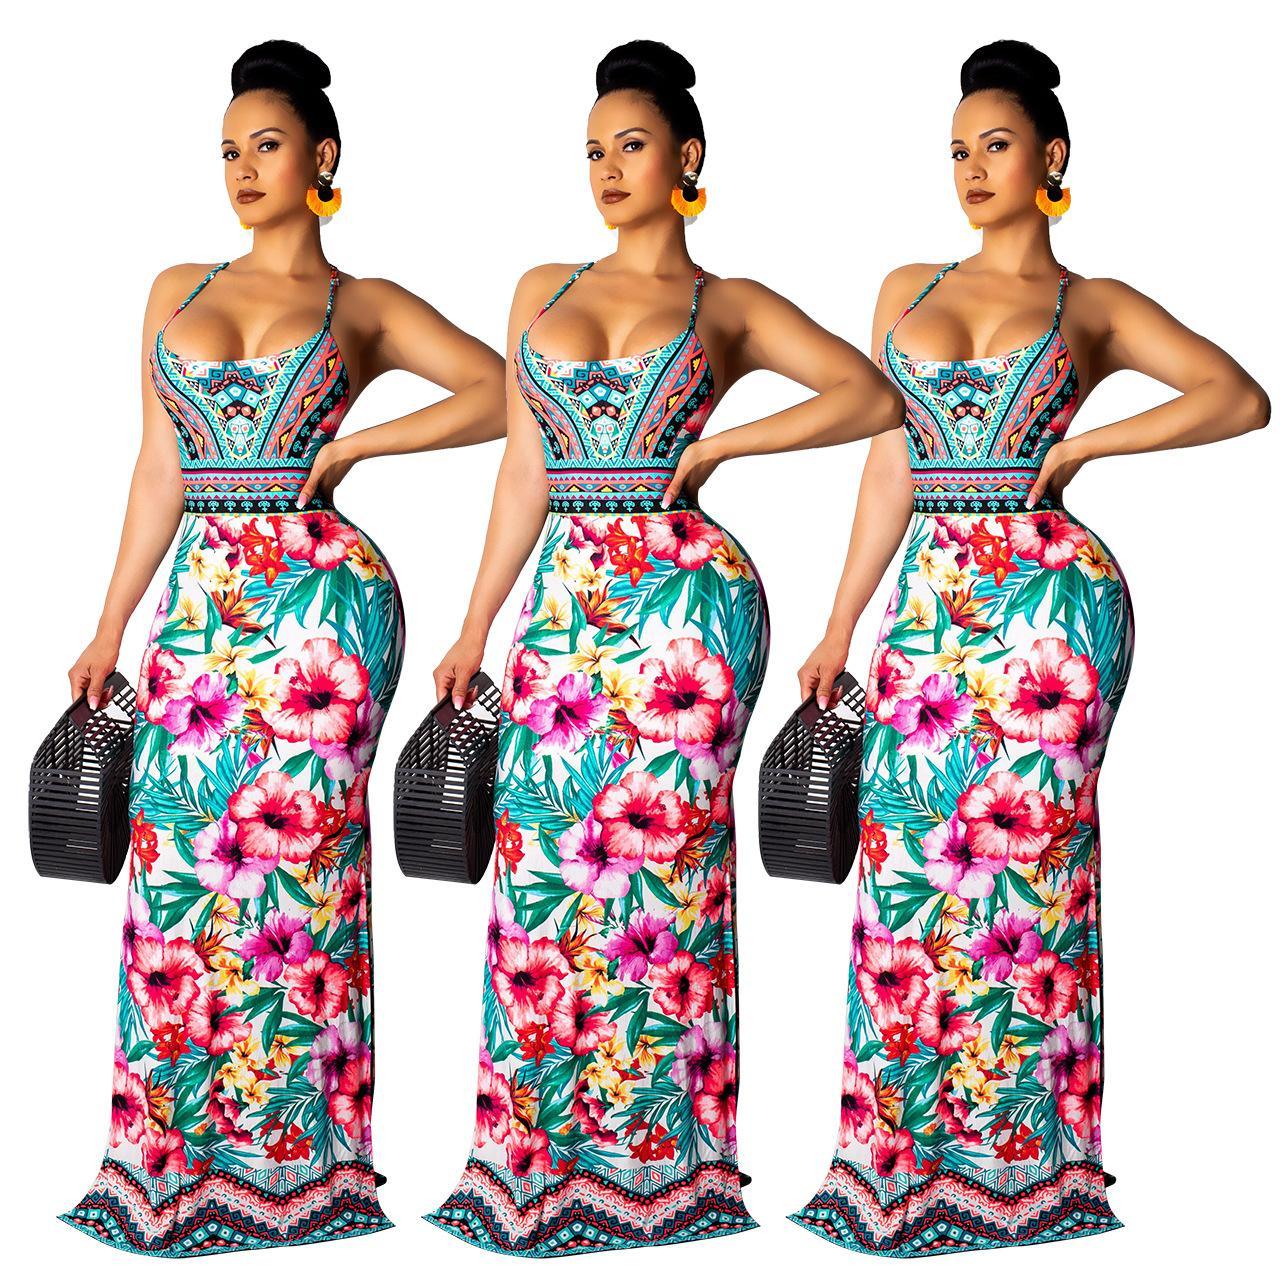 14767f40262 2019 Boho Ethnic Floral Print Maxi Dresses Women Sexy Spaghetti Straps Back  Lace Up Hollow Out Side Split Casual Beach Street Dress S 2XL Ladies Black  Dress ...